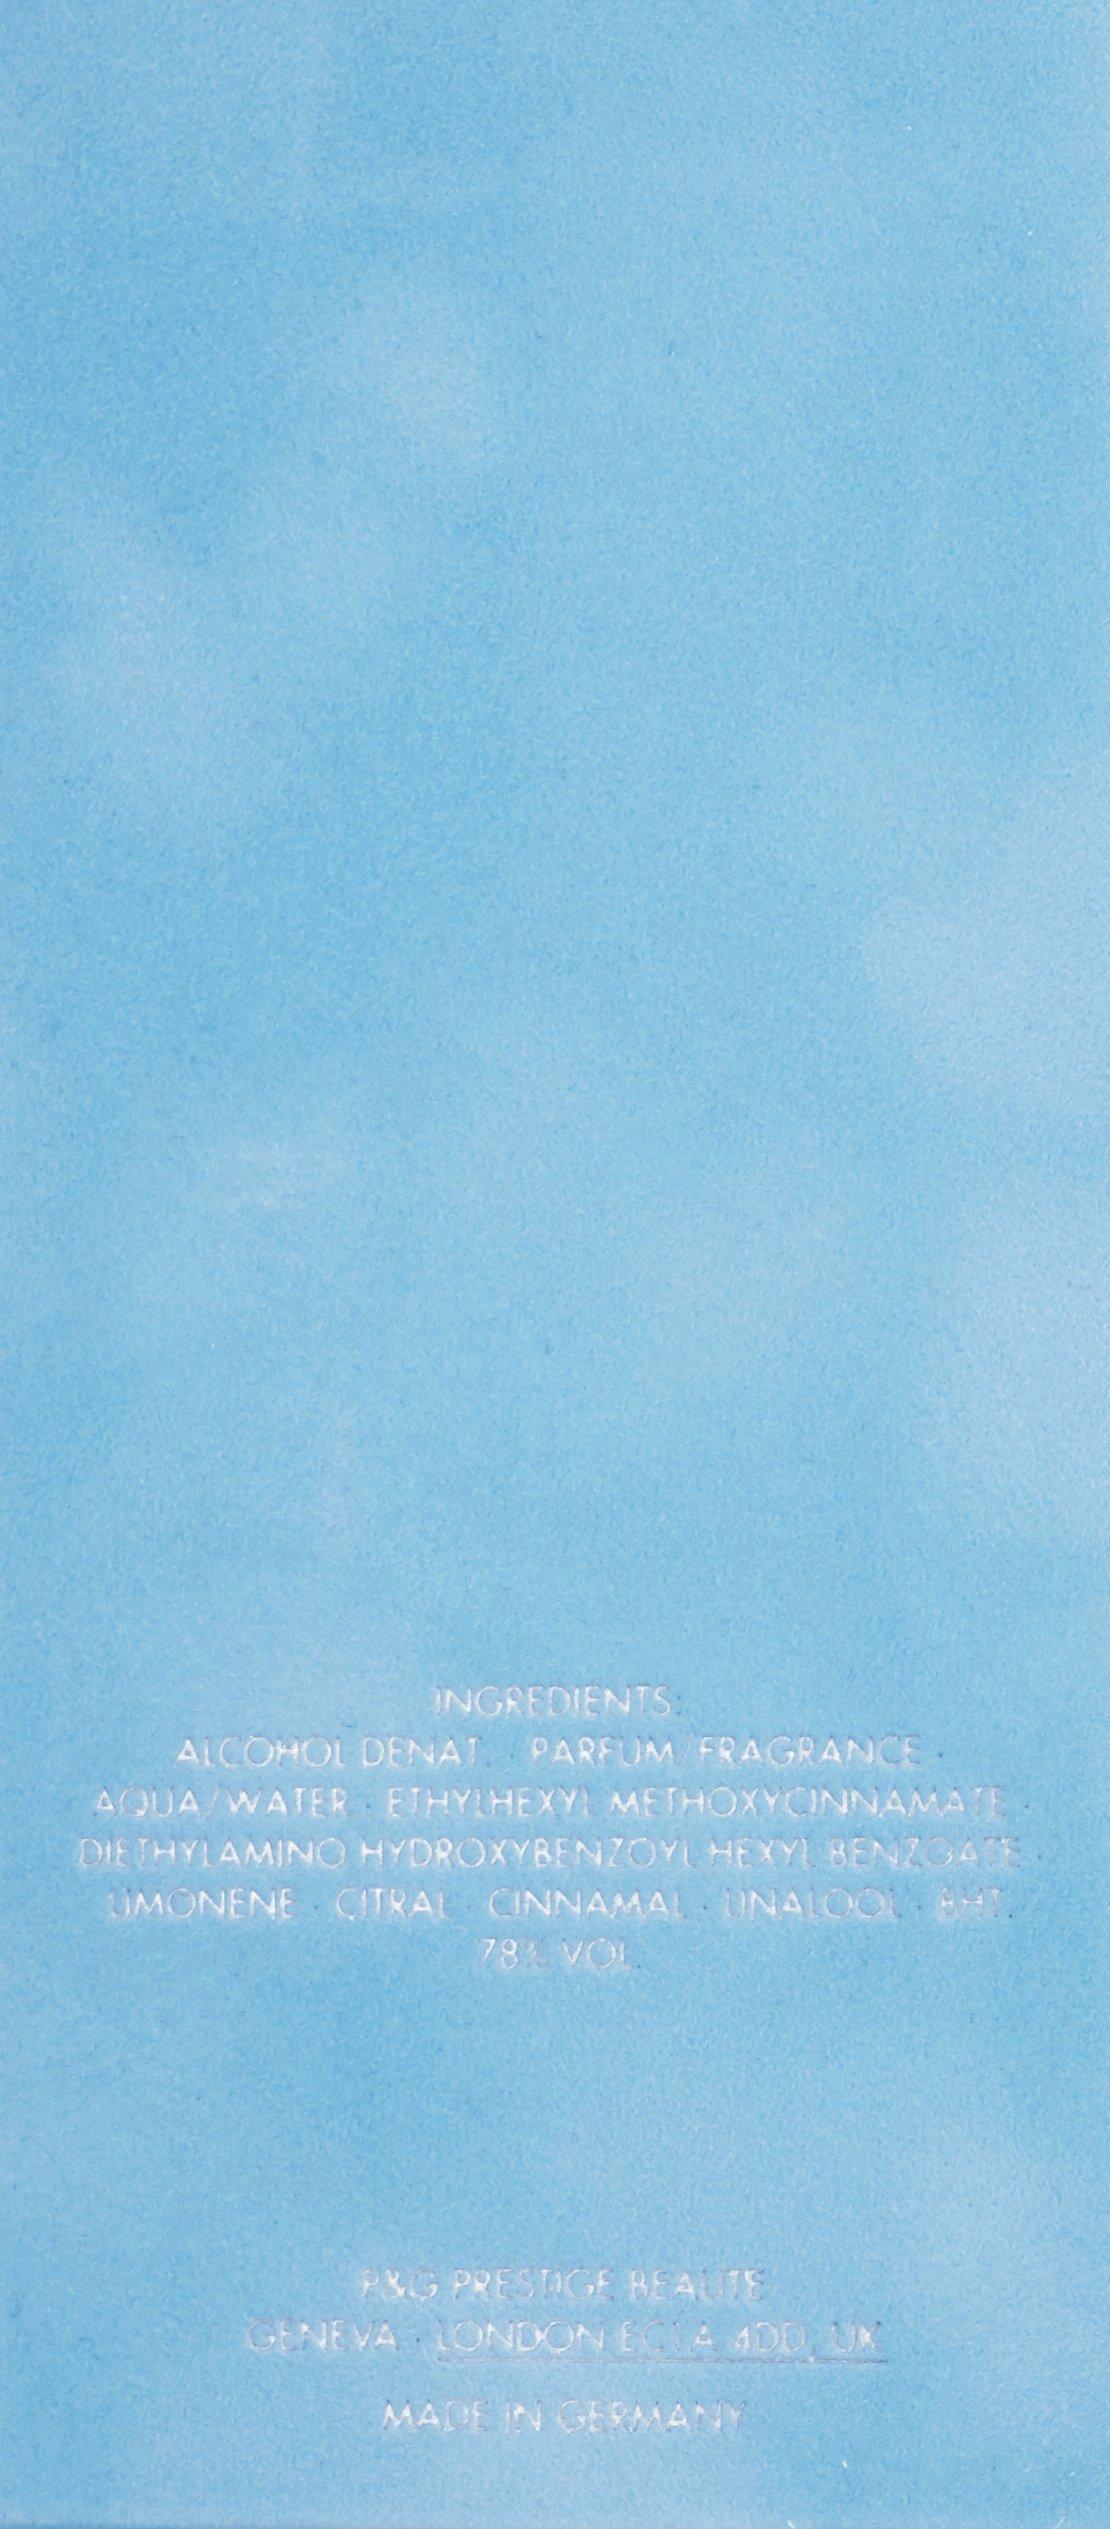 Dolce & Gabbana Light Blue By Dolce & Gabbana For Women. Eau De Toilette Spray 1.6 Oz by Dolce & Gabbana (Image #2)